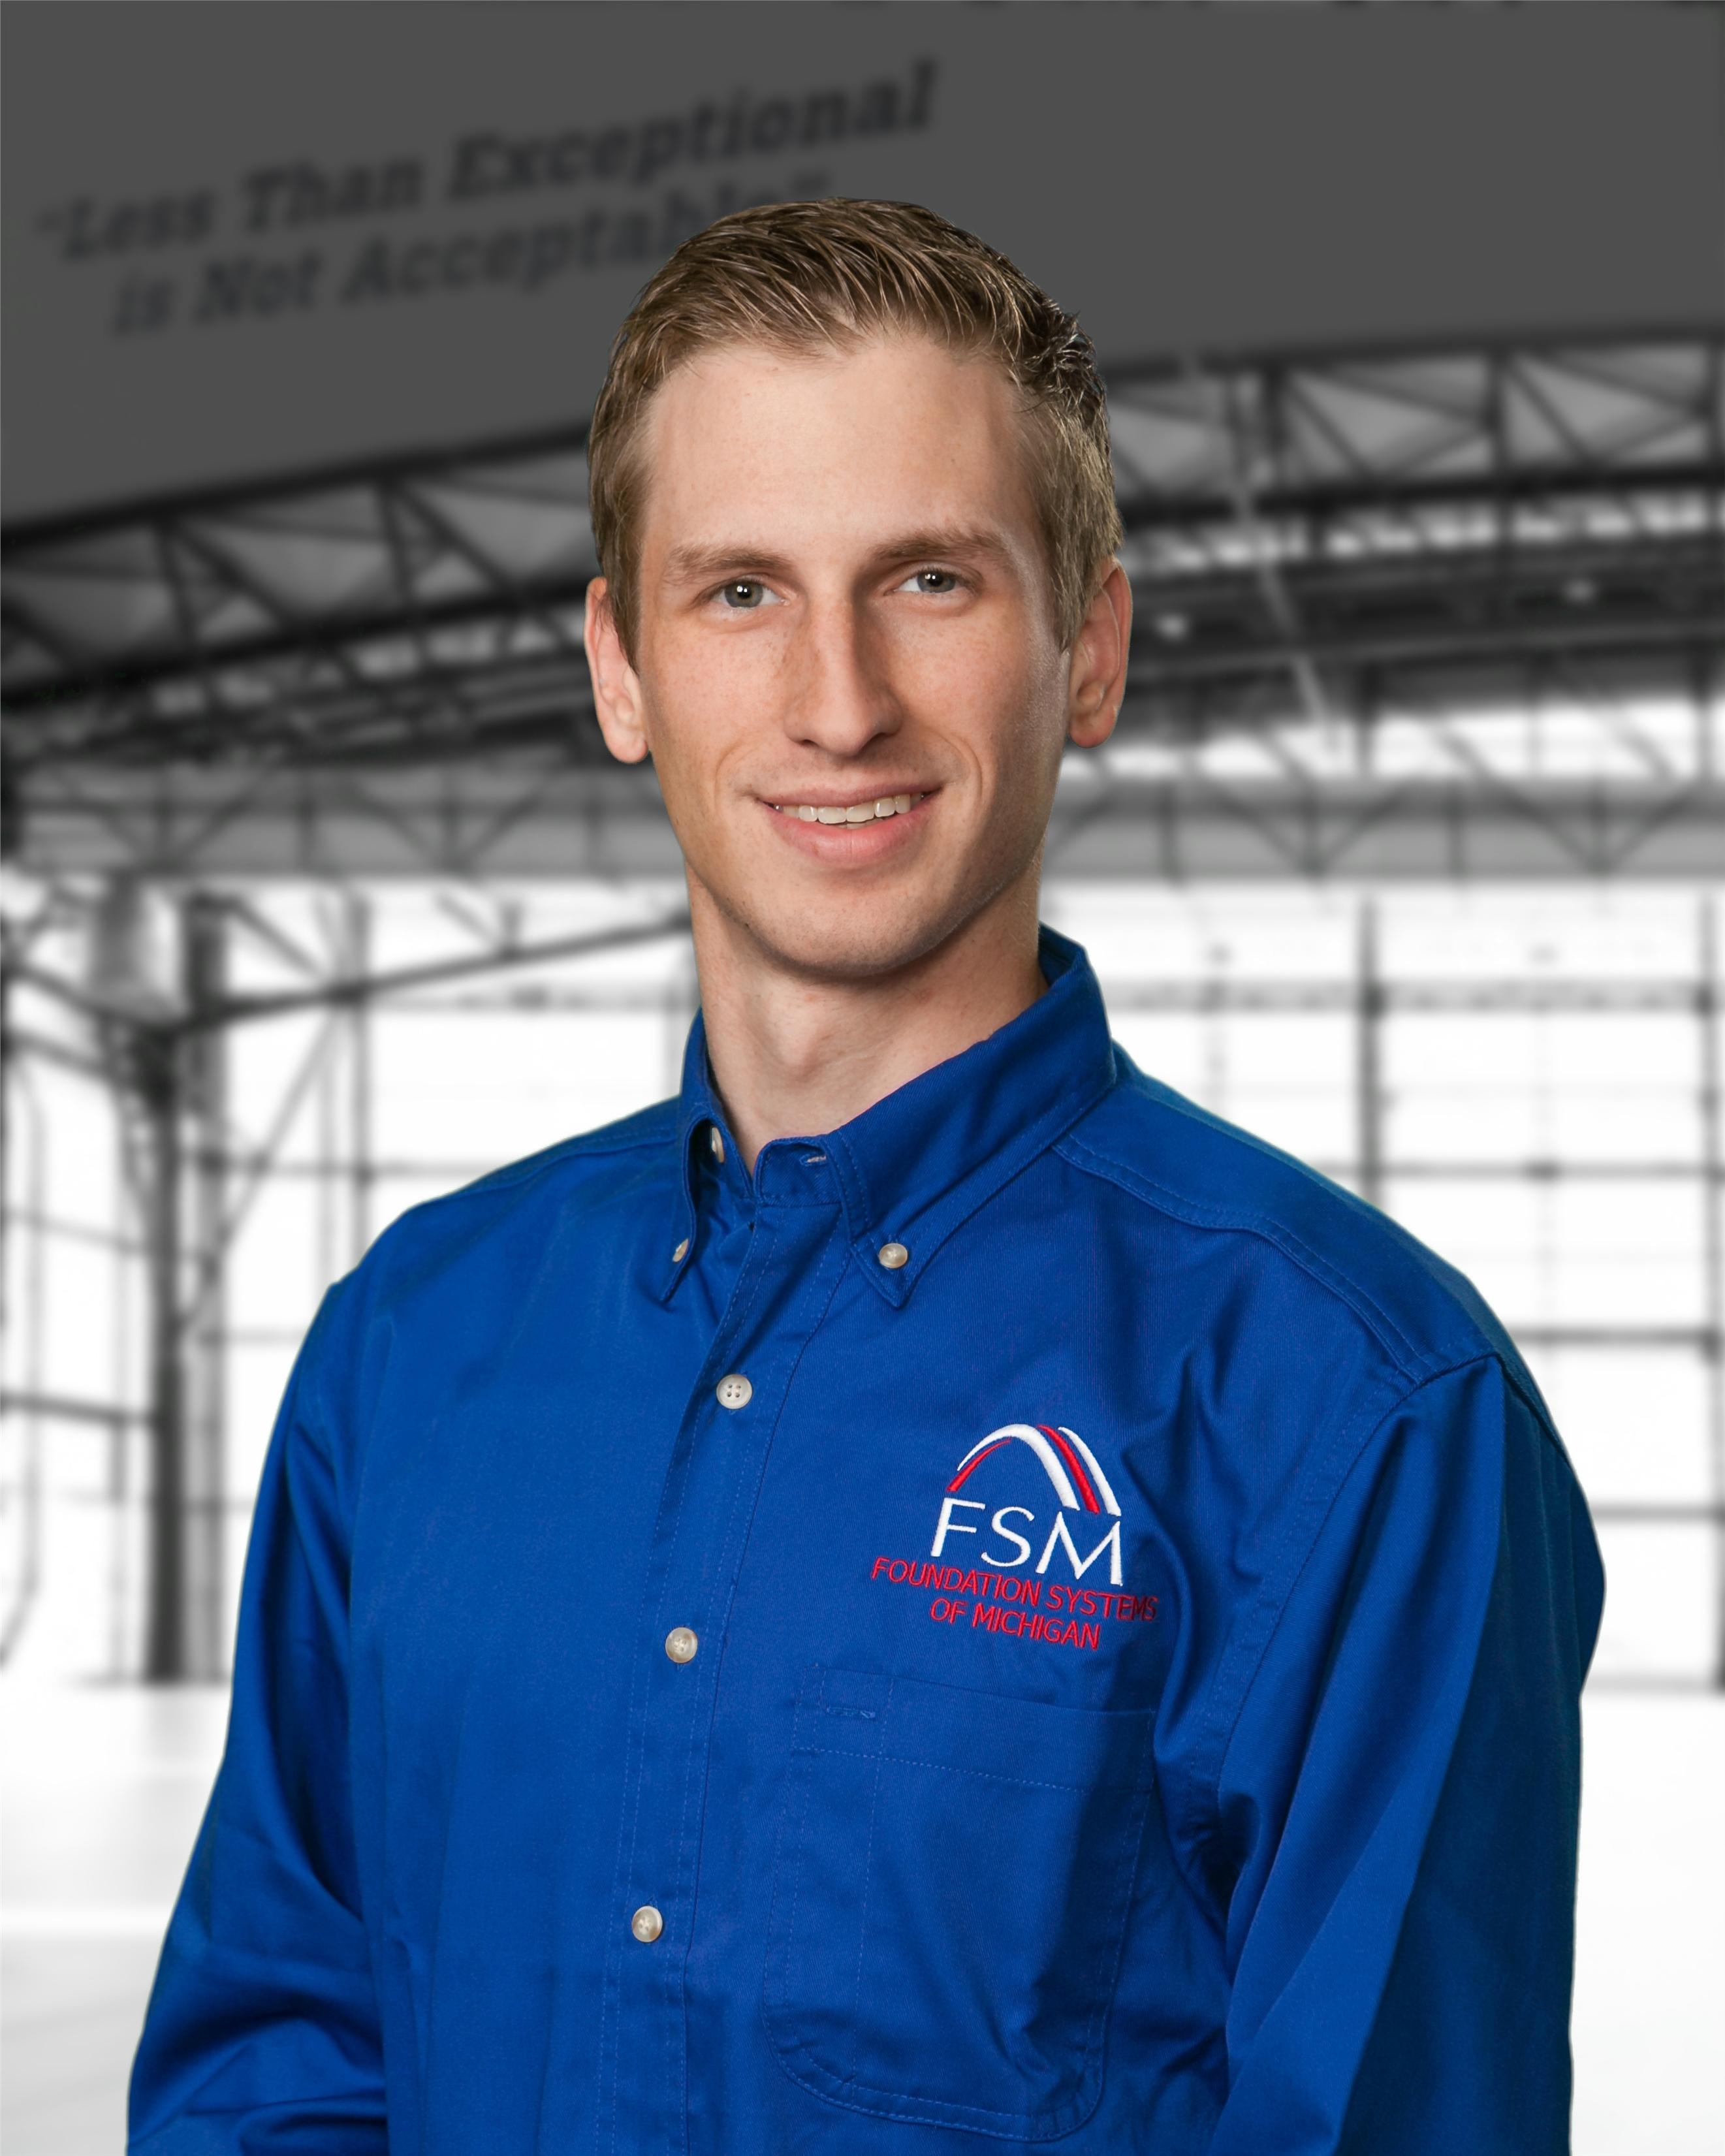 FSM Kyle Maddock Service Technician